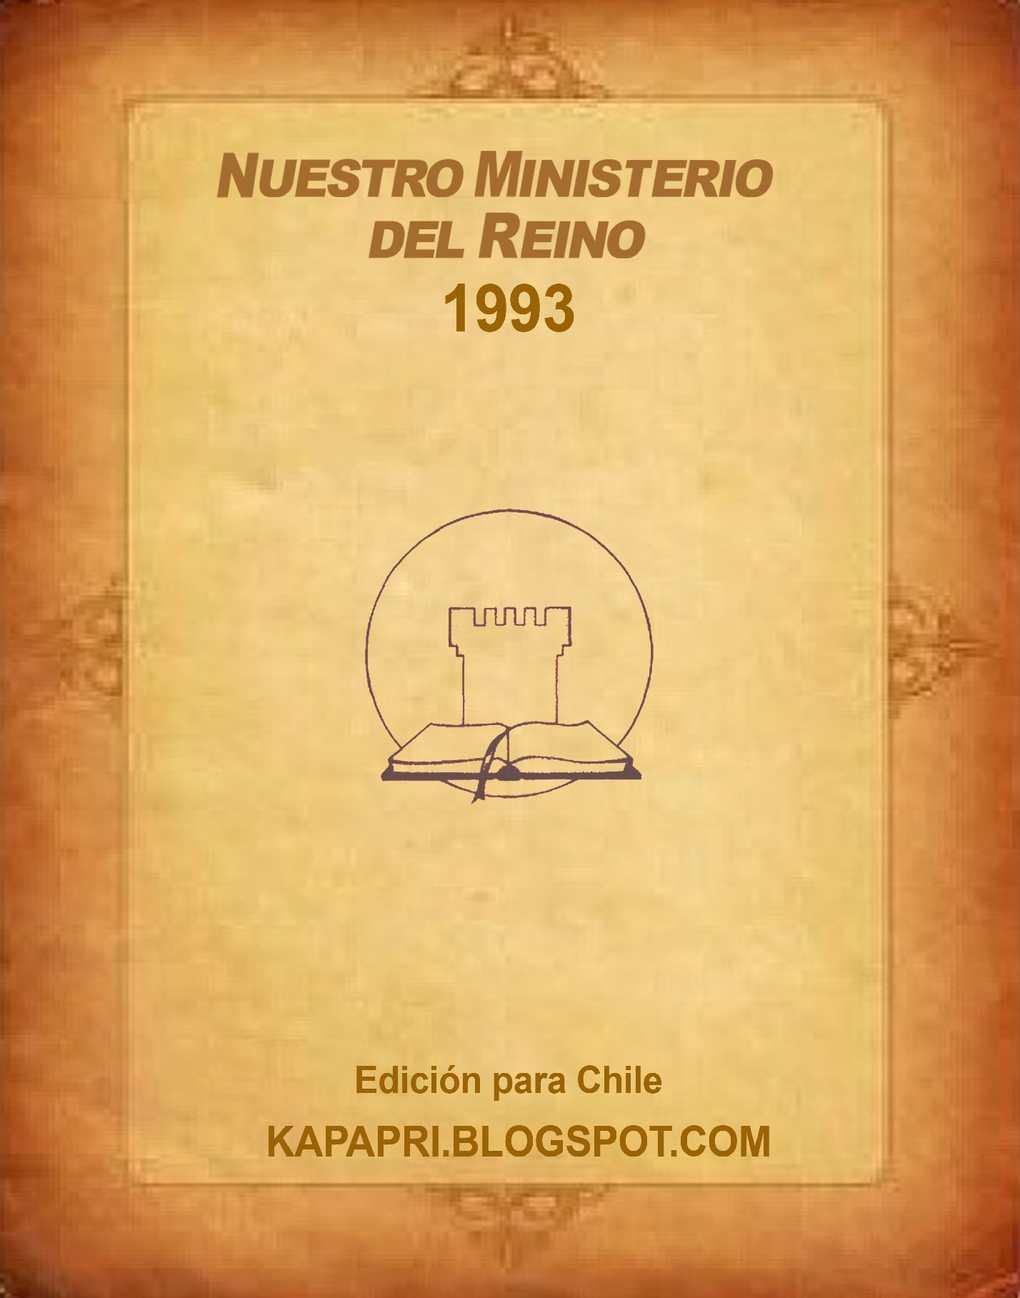 Calaméo - 1993 Nuestro Ministerio del Reino